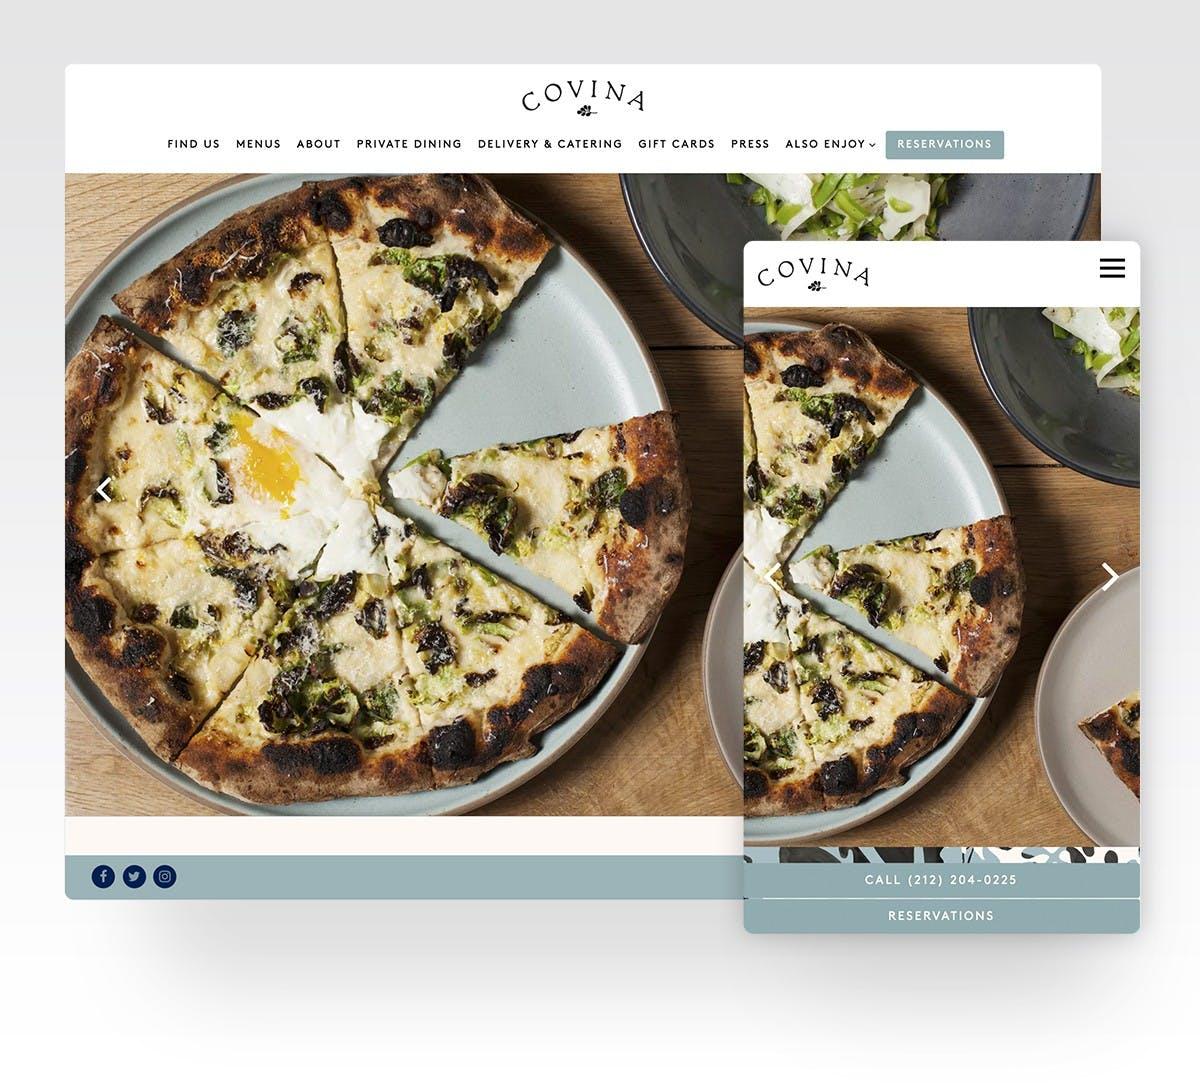 Covina's website